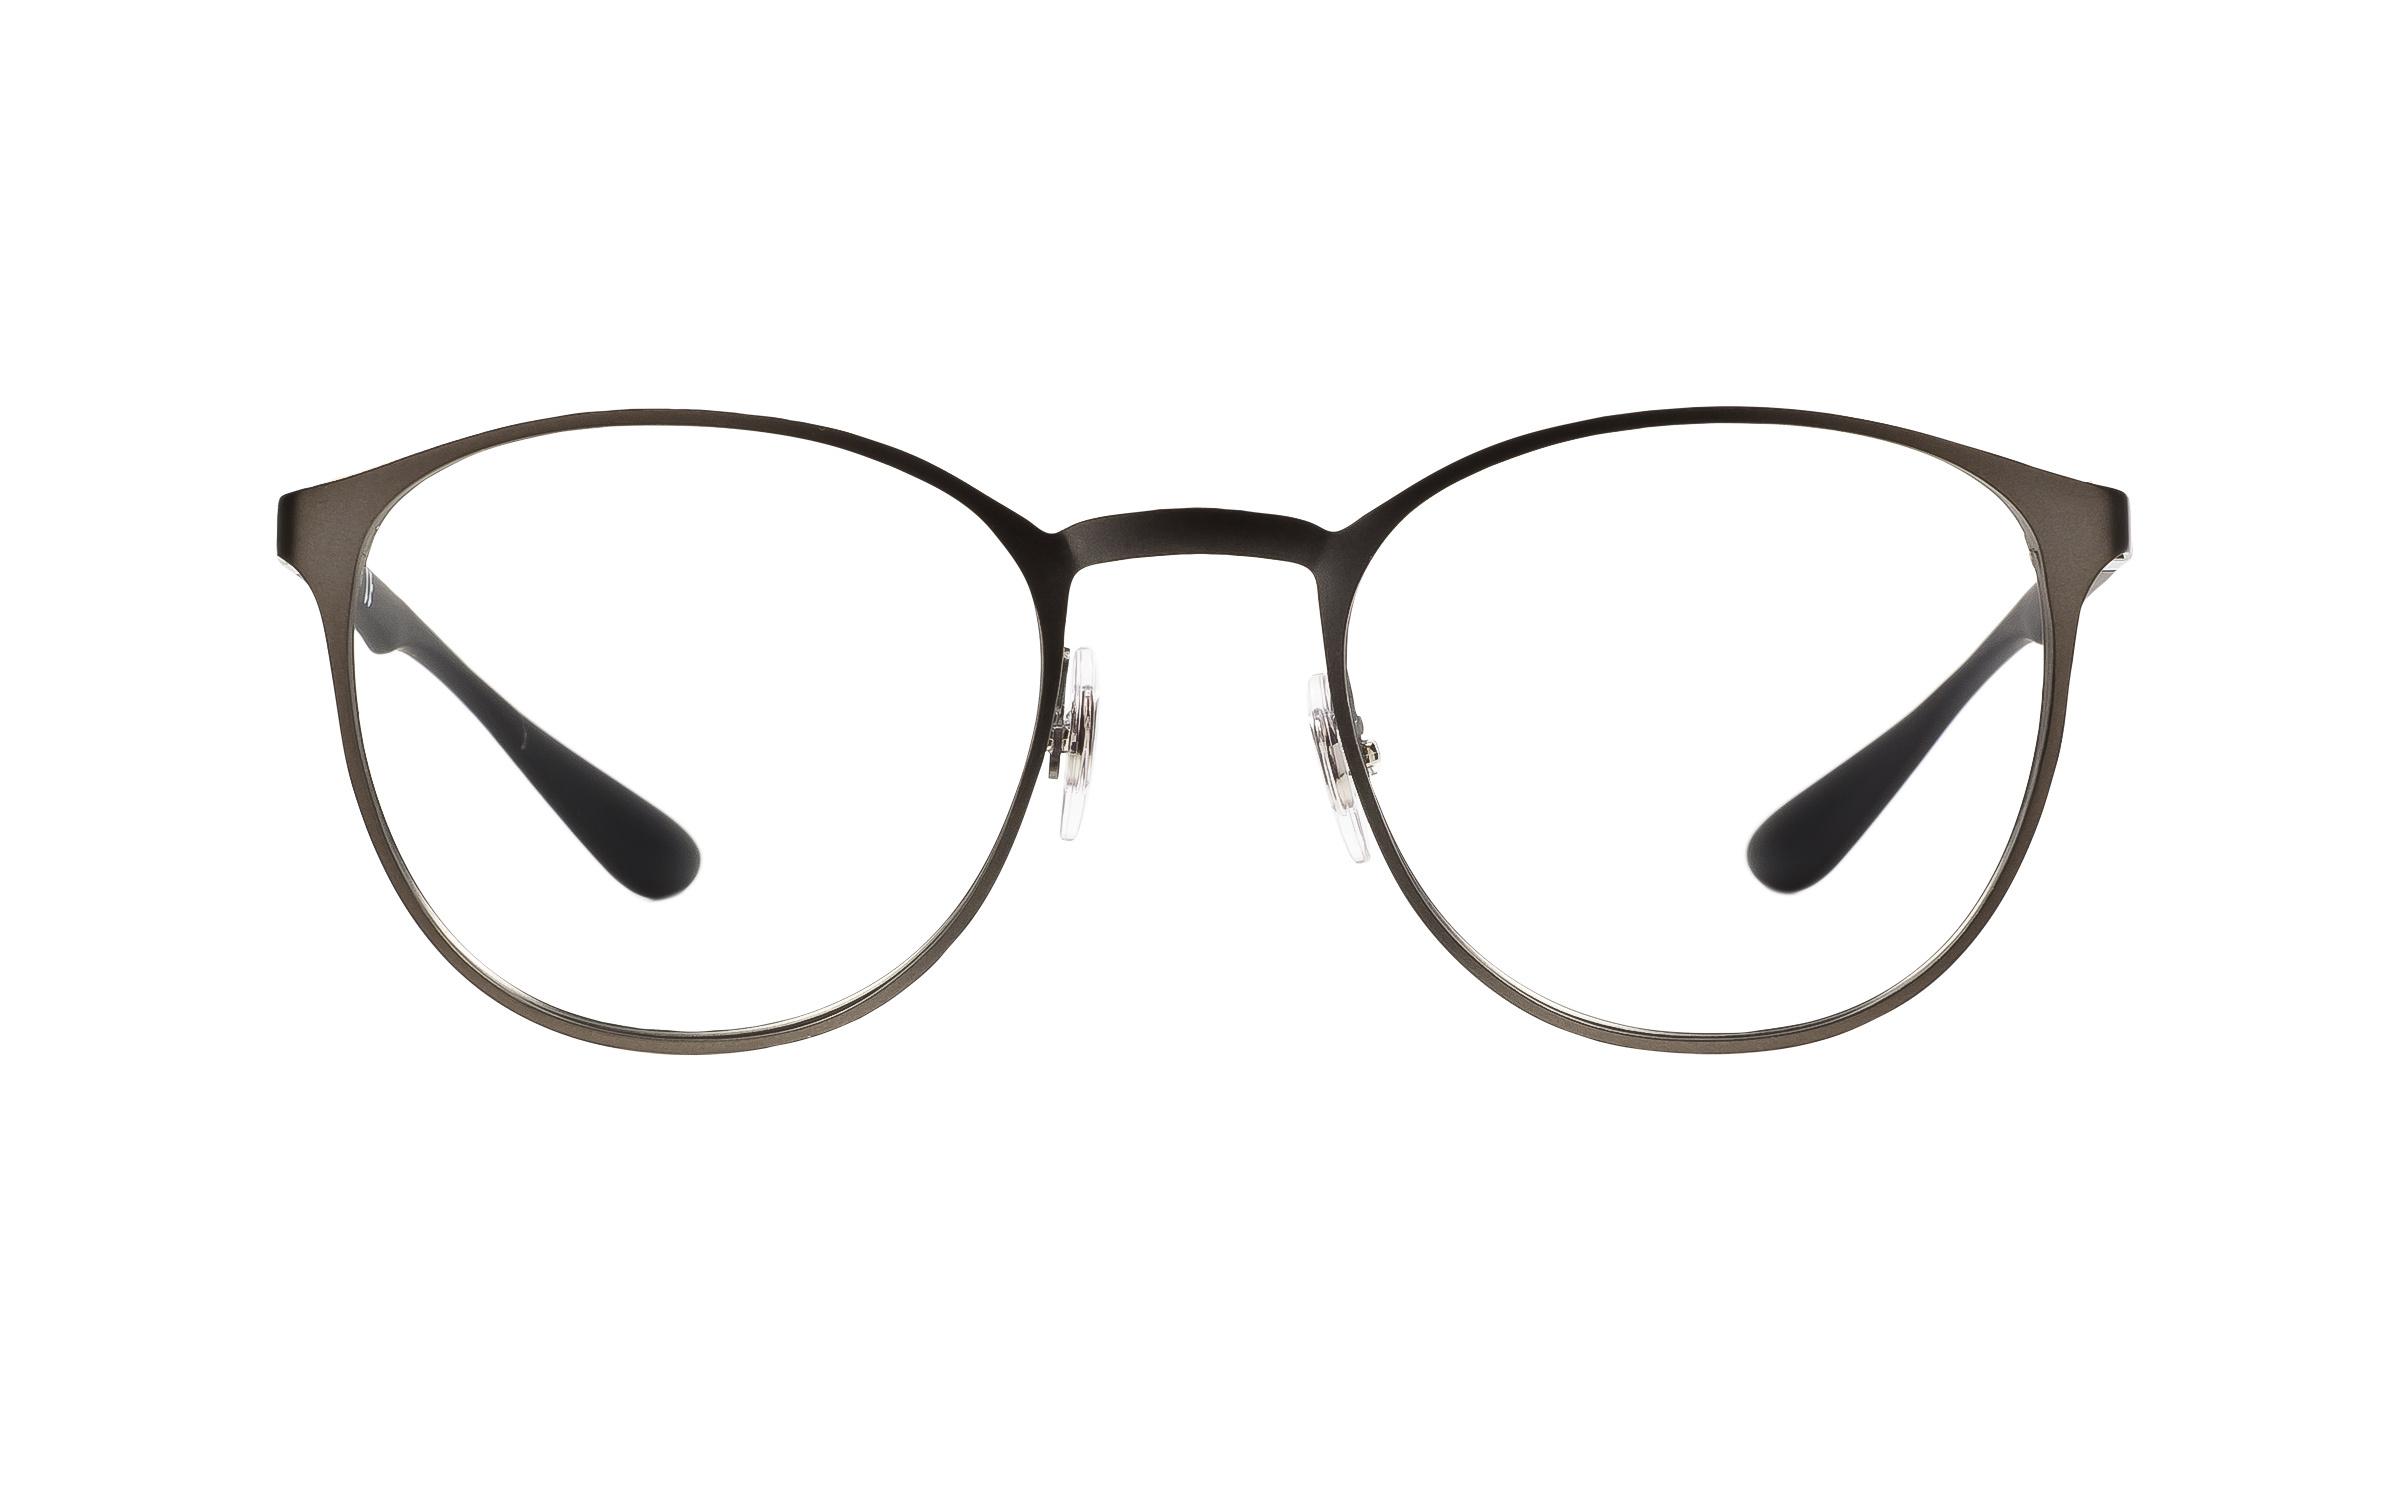 http://www.coastal.com/ - Ray-Ban Glasses Wing-Tip Grey Metal Online Coastal